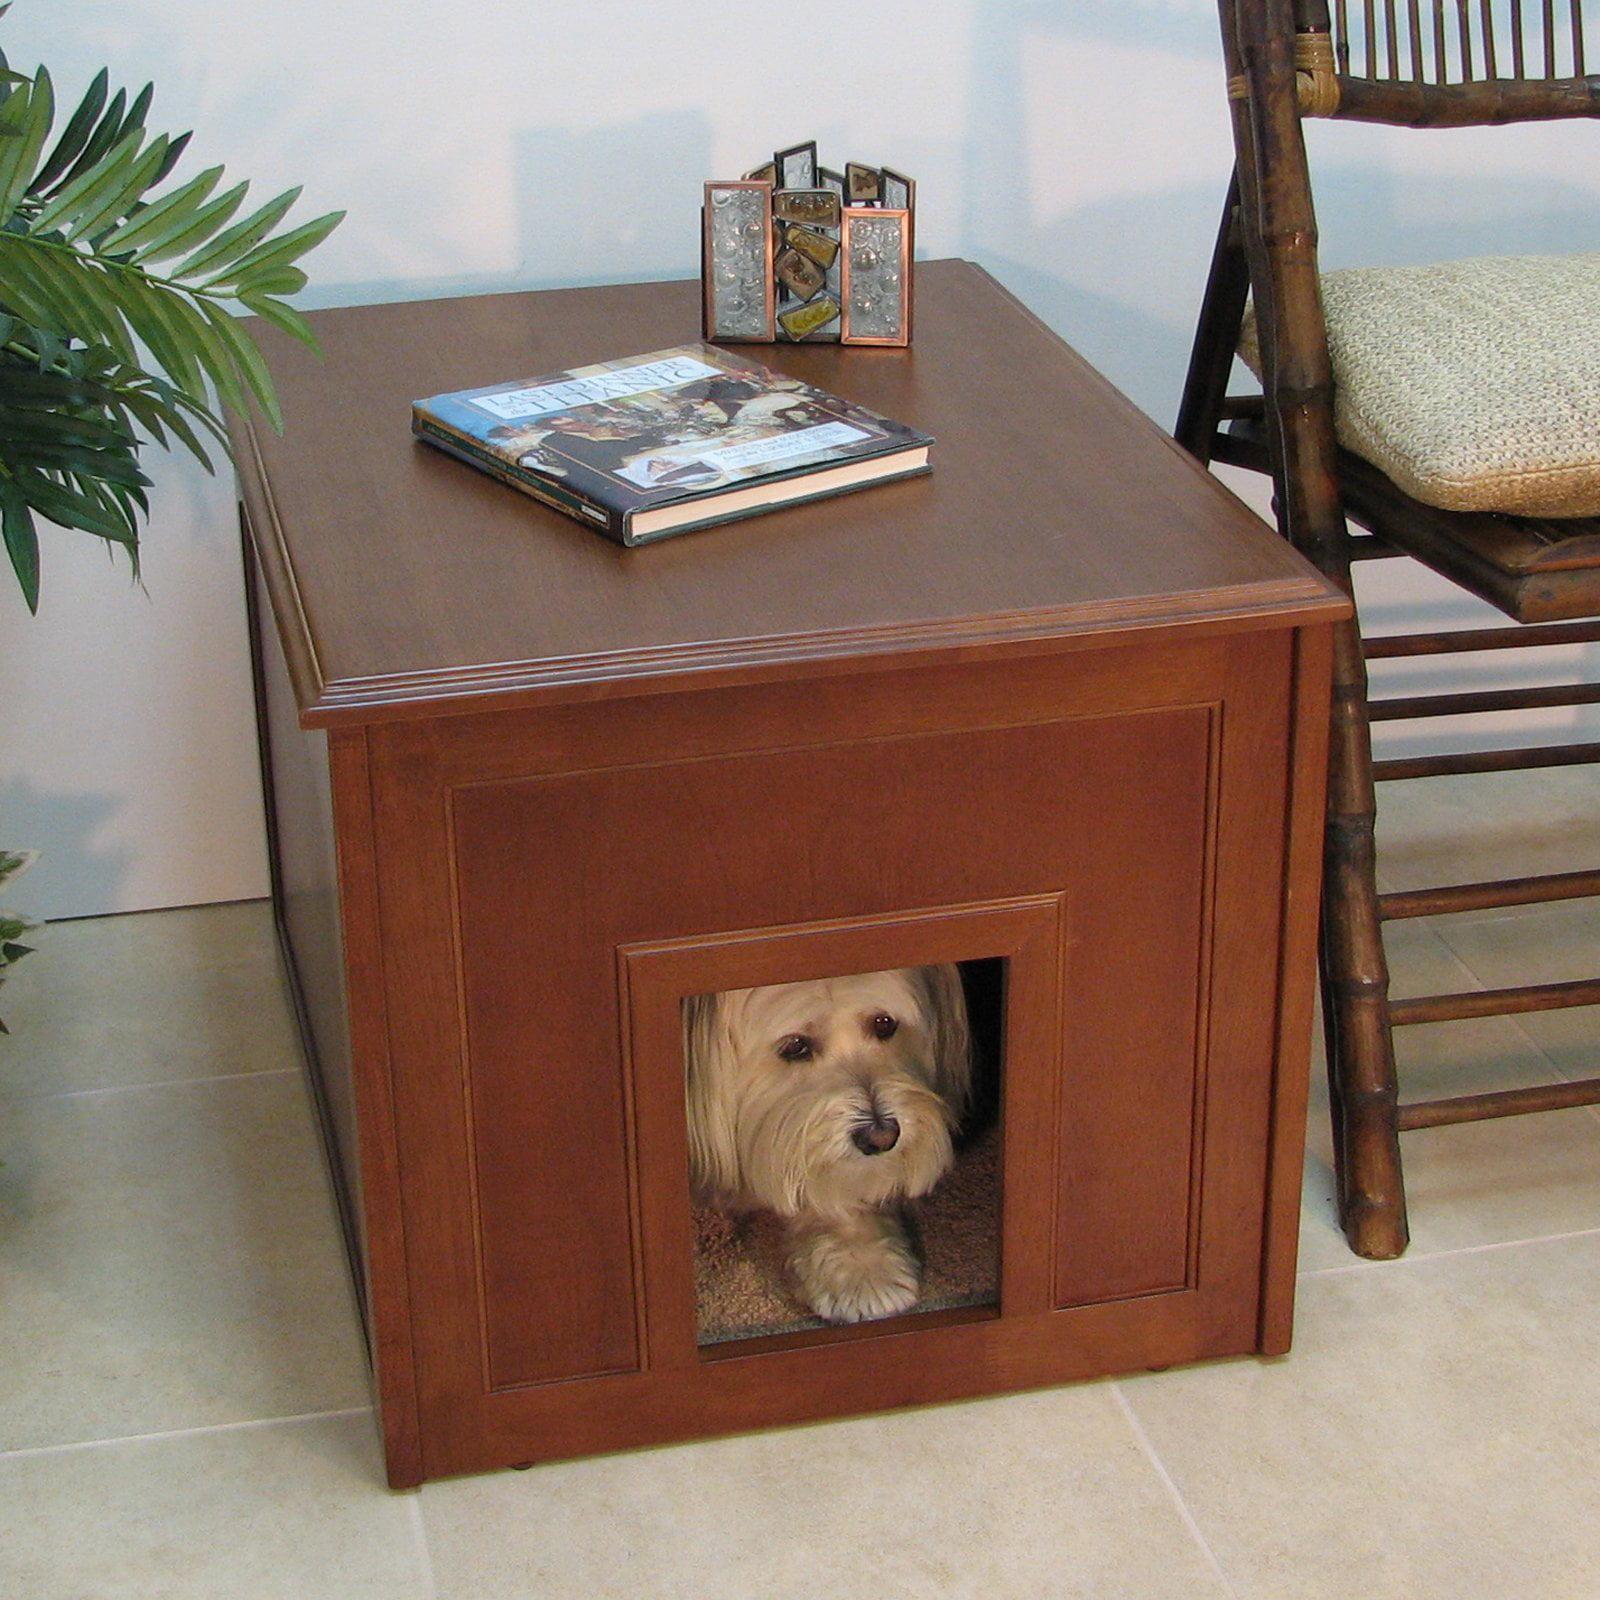 Indoor dog house - Indoor Dog House 8